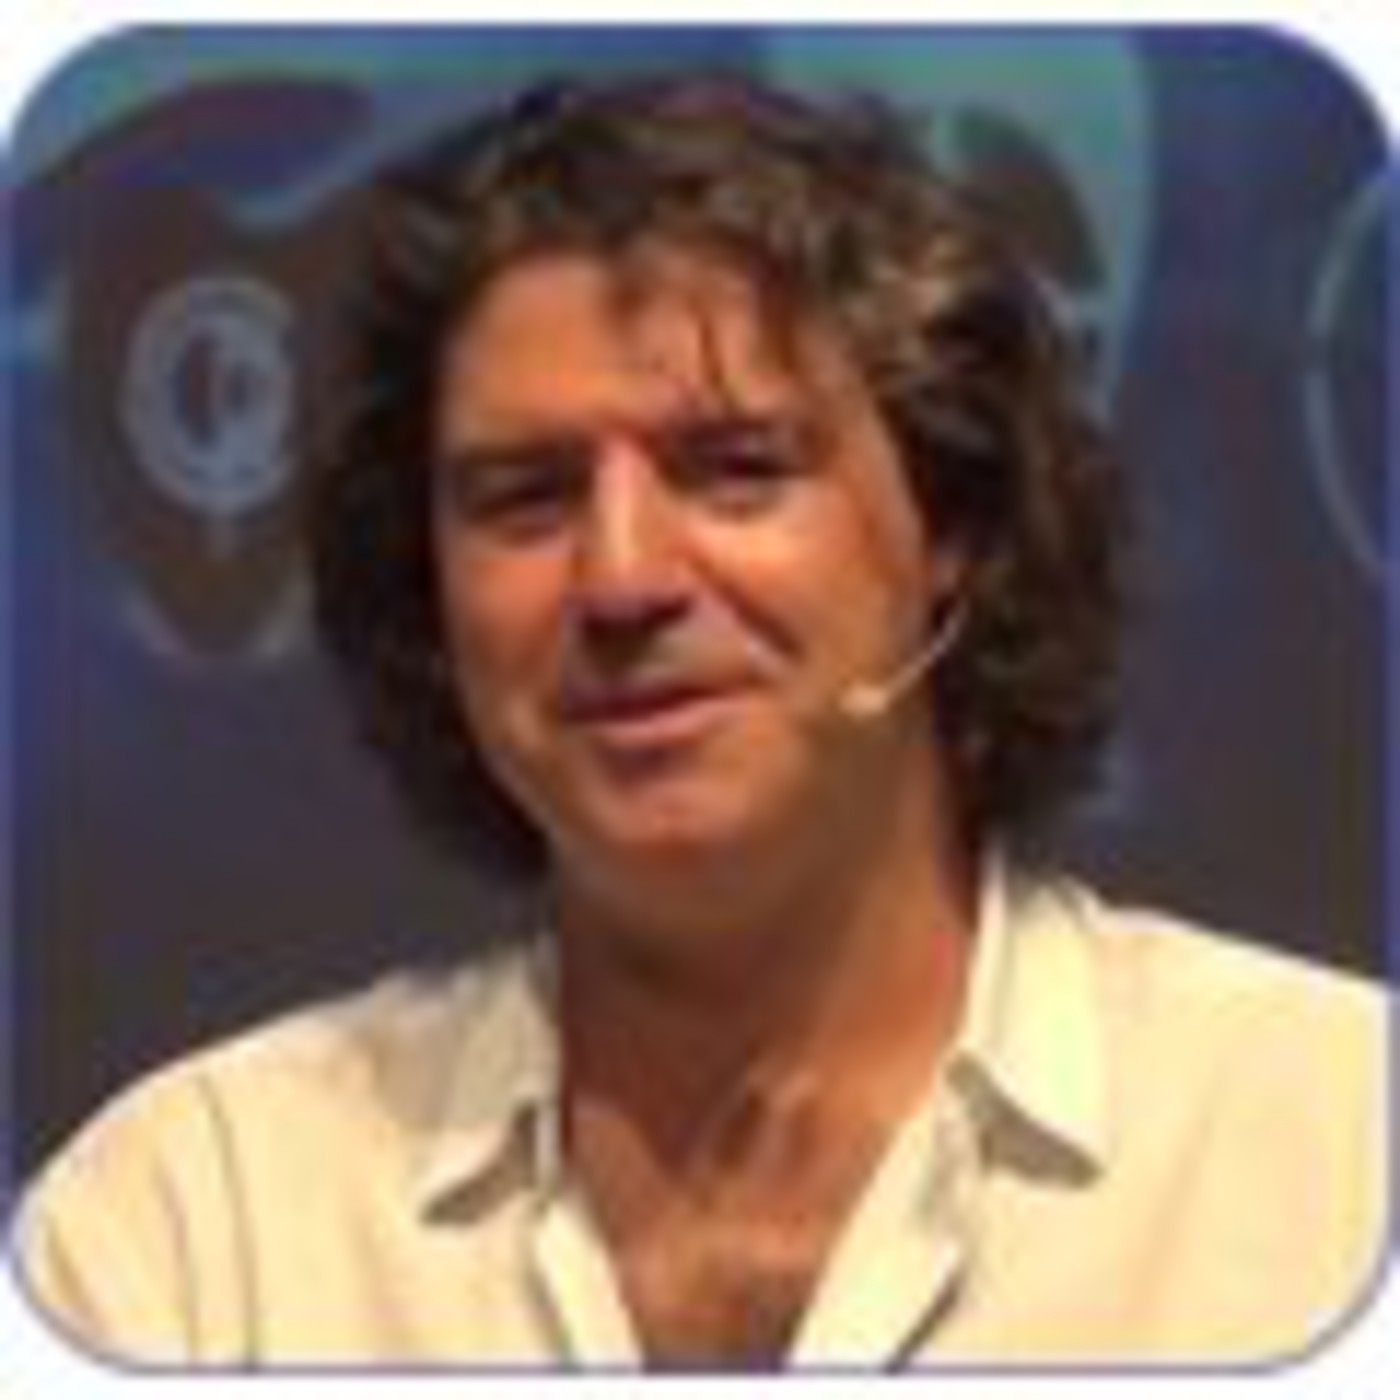 Jorge Lomar